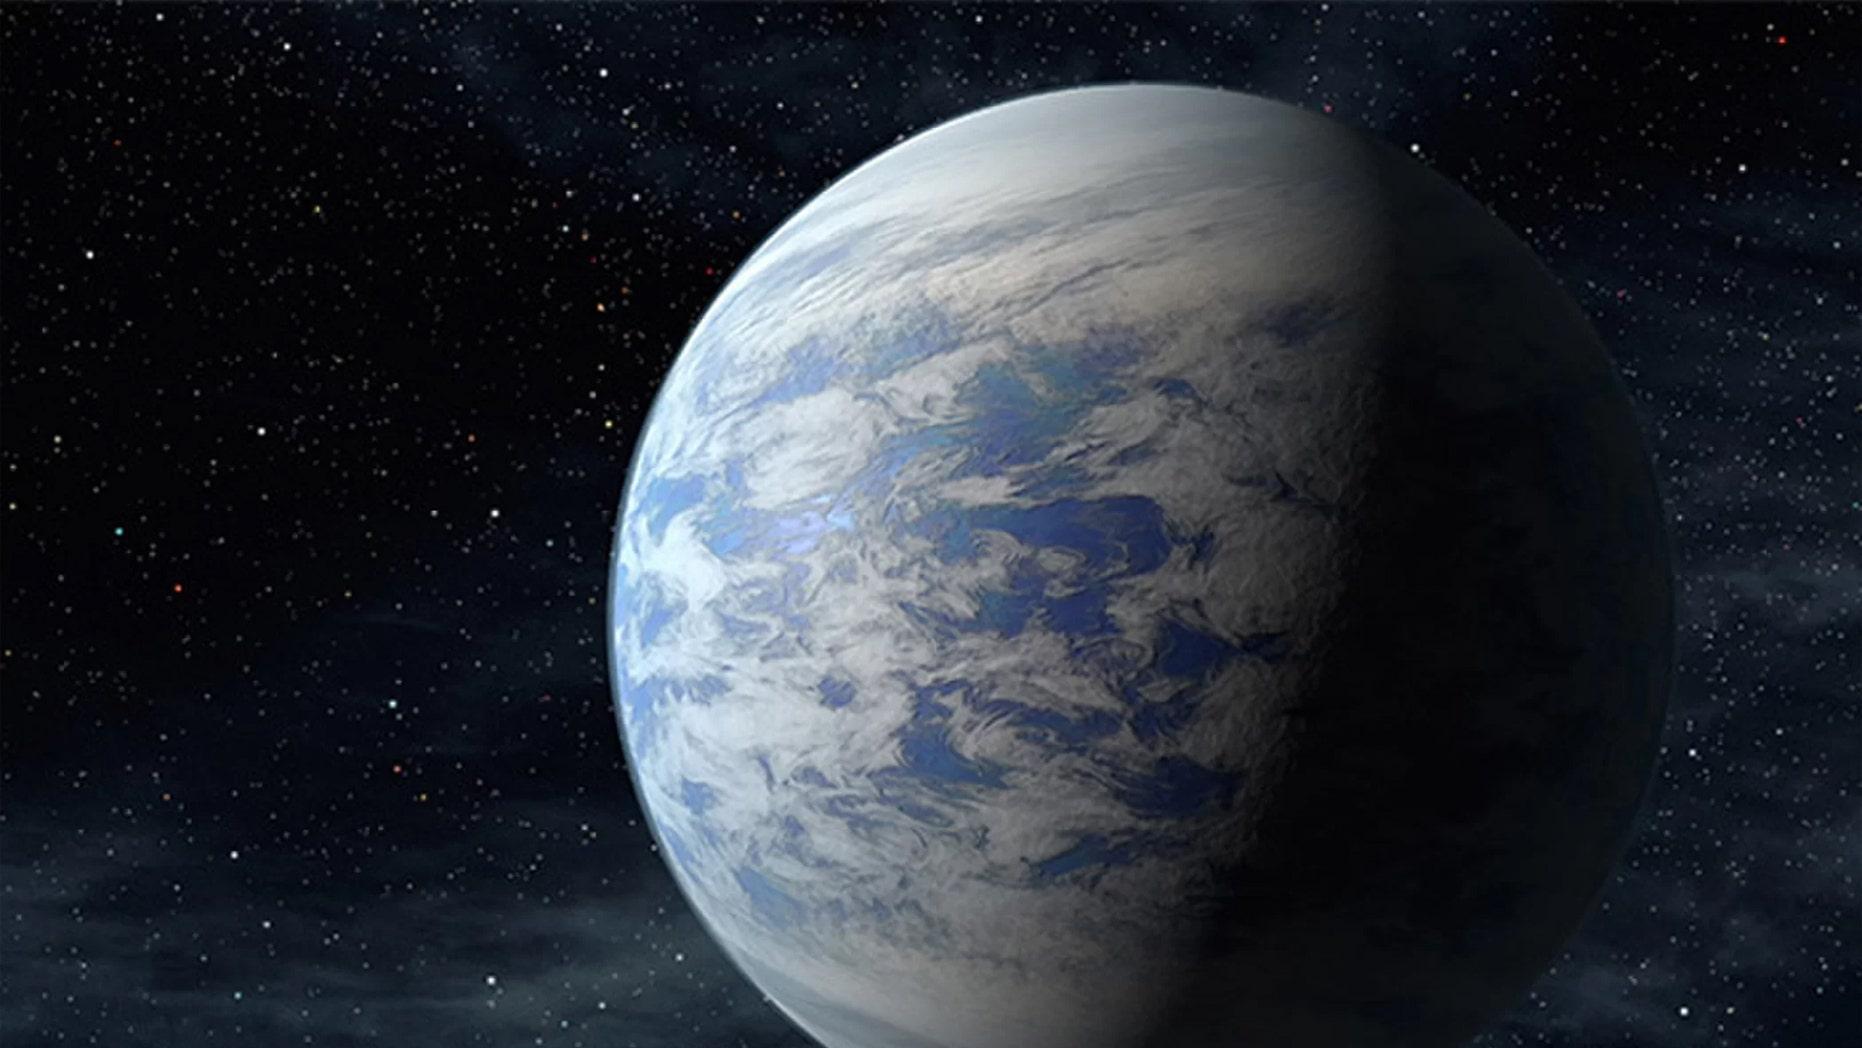 Artist's illustration of the super-Earth alien planet Kepler-69c. Credit: NASA